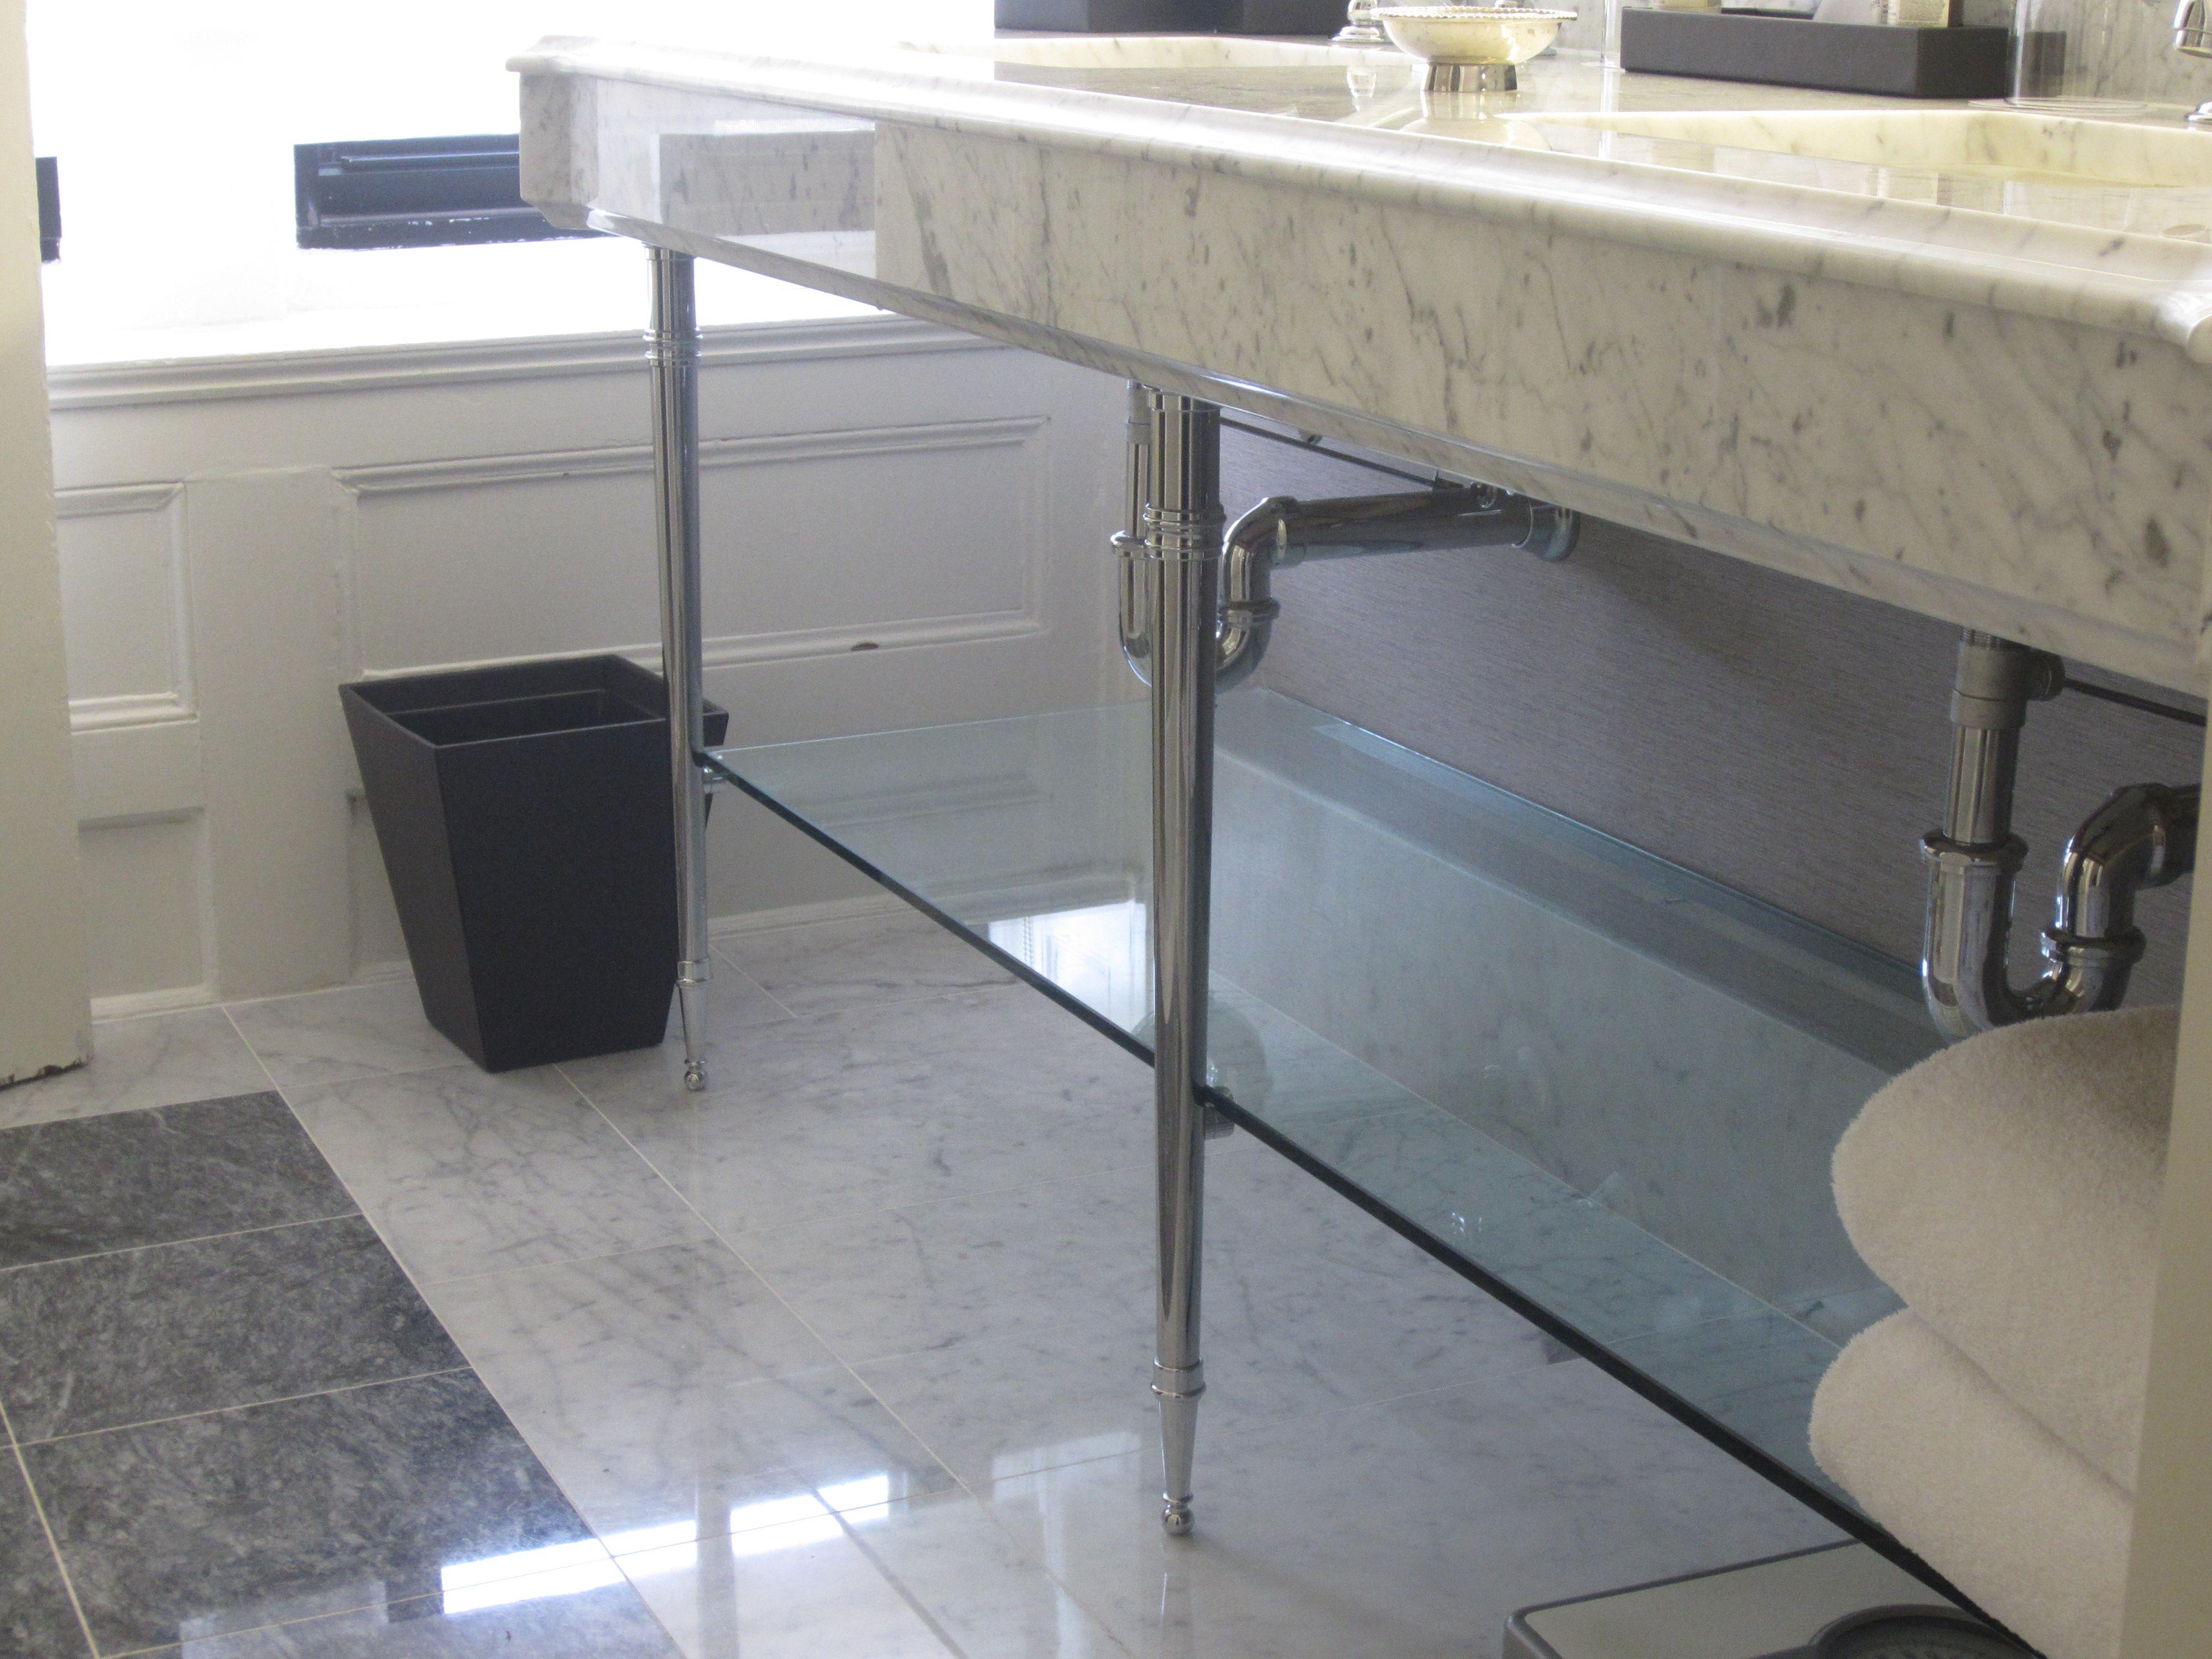 Best Vanities Images Onbathroom Ideas Room and